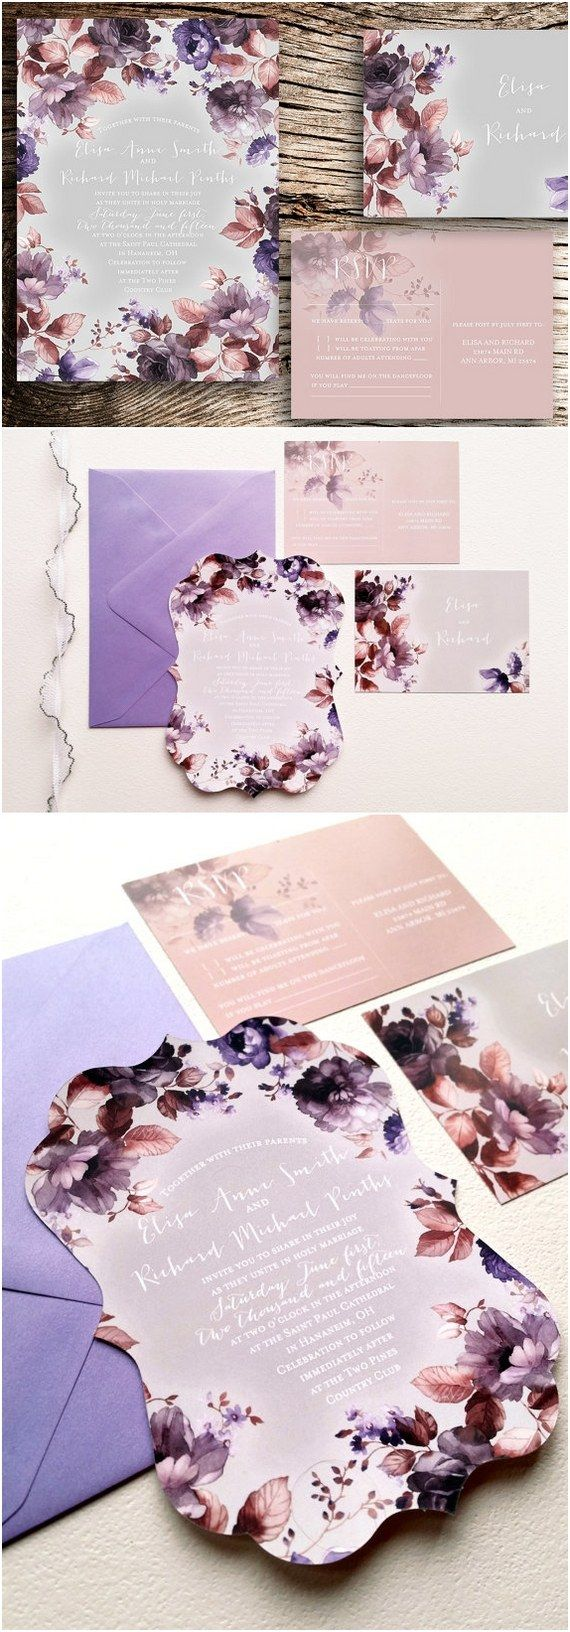 die cut wedding invitations floral wedding invitations die cut covington design ornate die - Wedding Invitations Purple